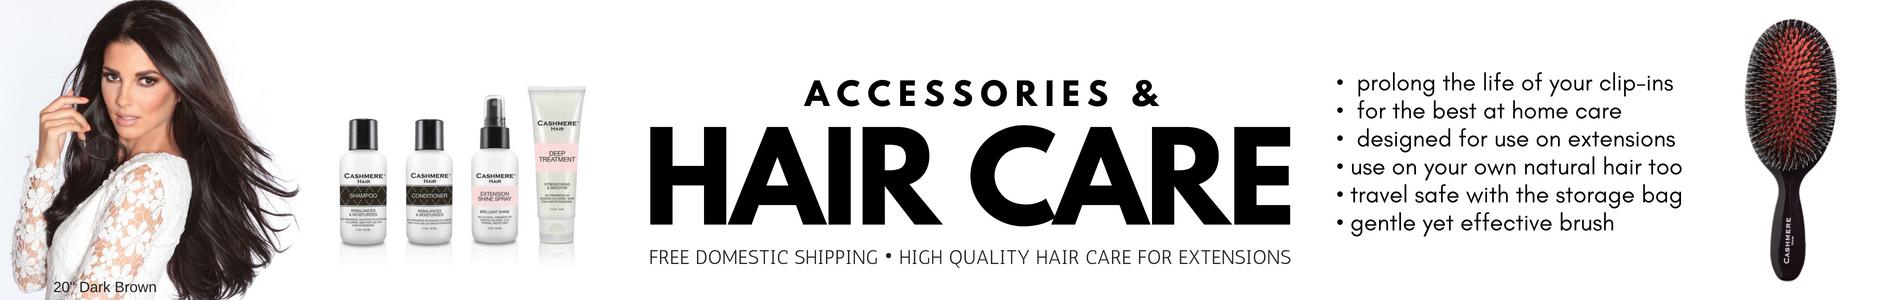 6-haircare.png